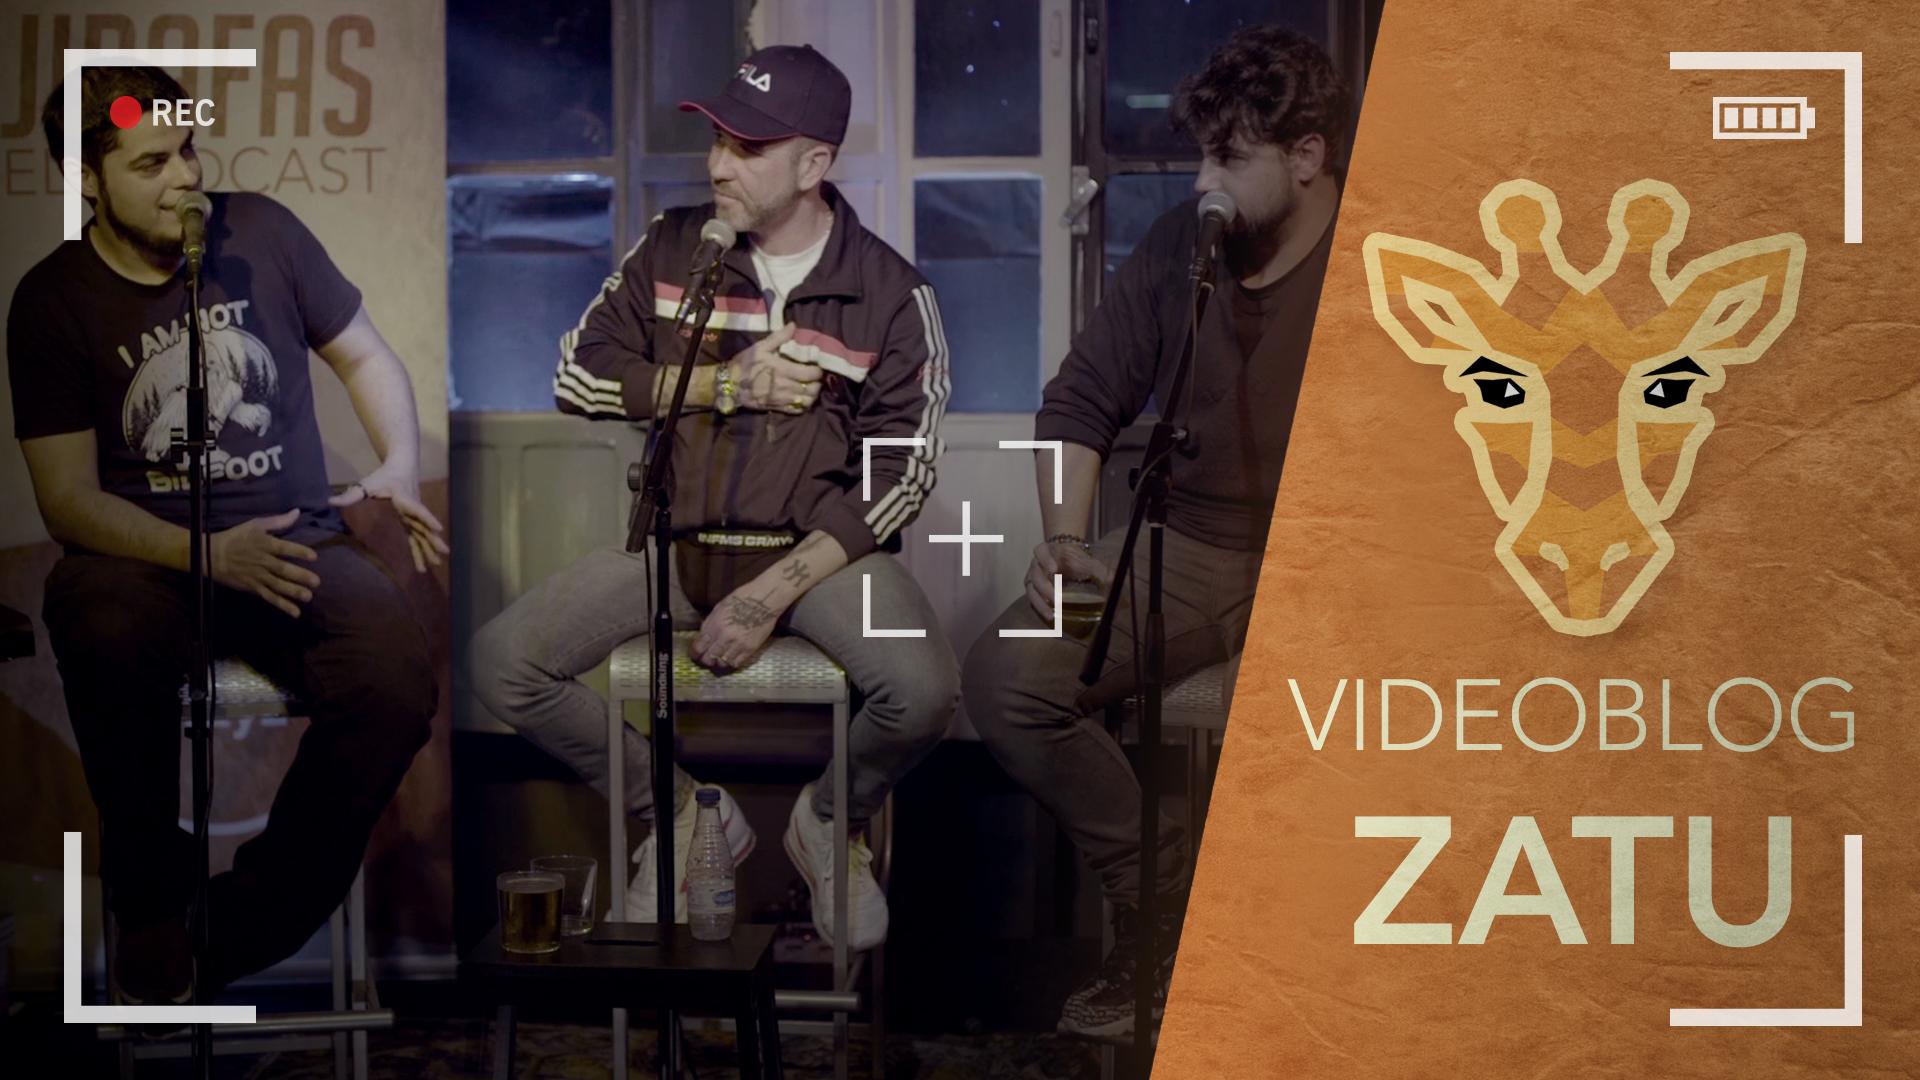 Jirafas 1 -  David Sainz, Juan Amodeo y Zatu